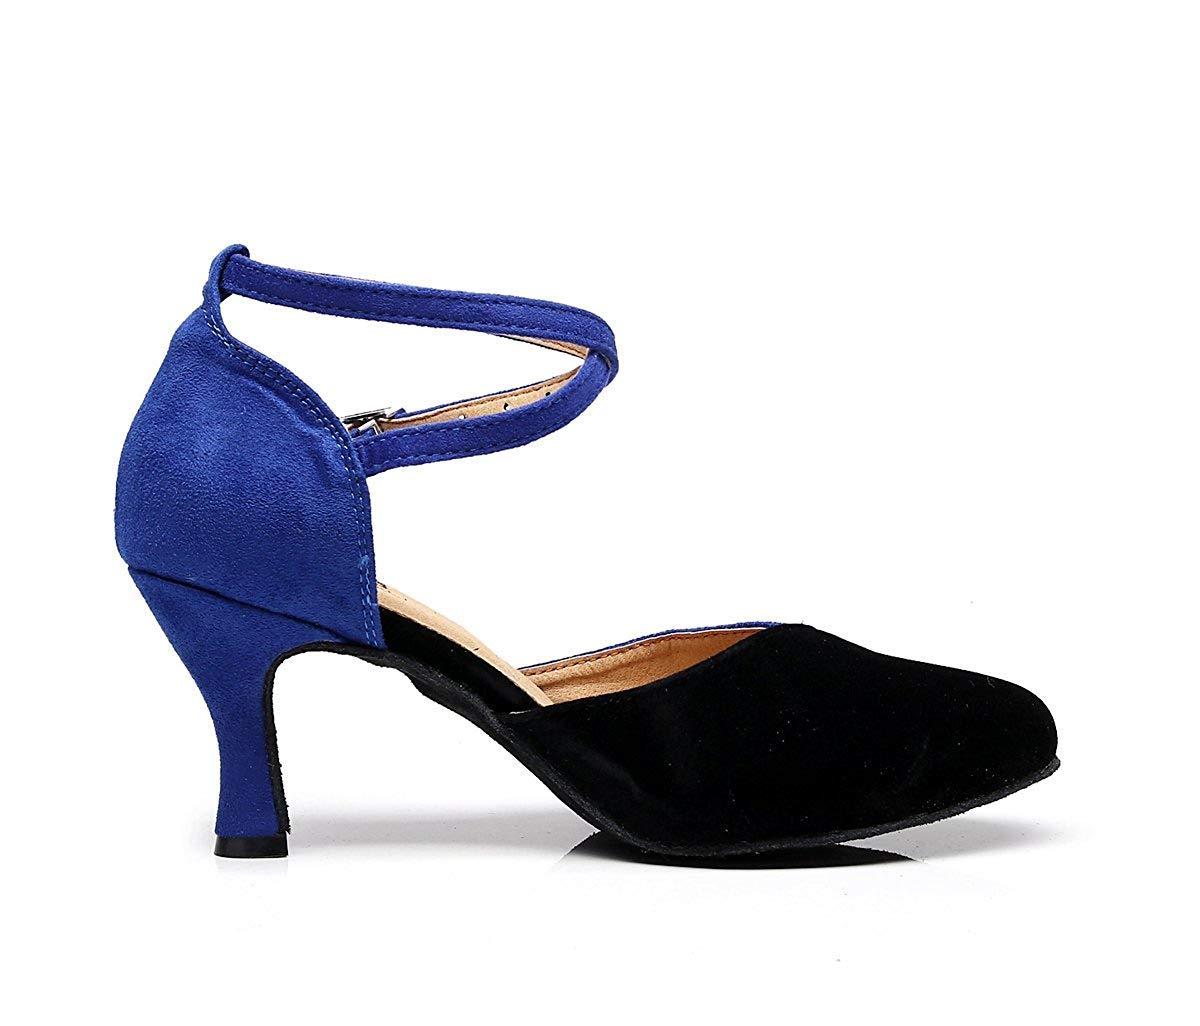 Qiusa TJ7136 Damen Mädchen Knöchelriemen Knöchelriemen Knöchelriemen Blau Wildleder Latin Dancing Schuhe Formale Partei Pumps UK 4 (Farbe   - Größe   -) aad0fa